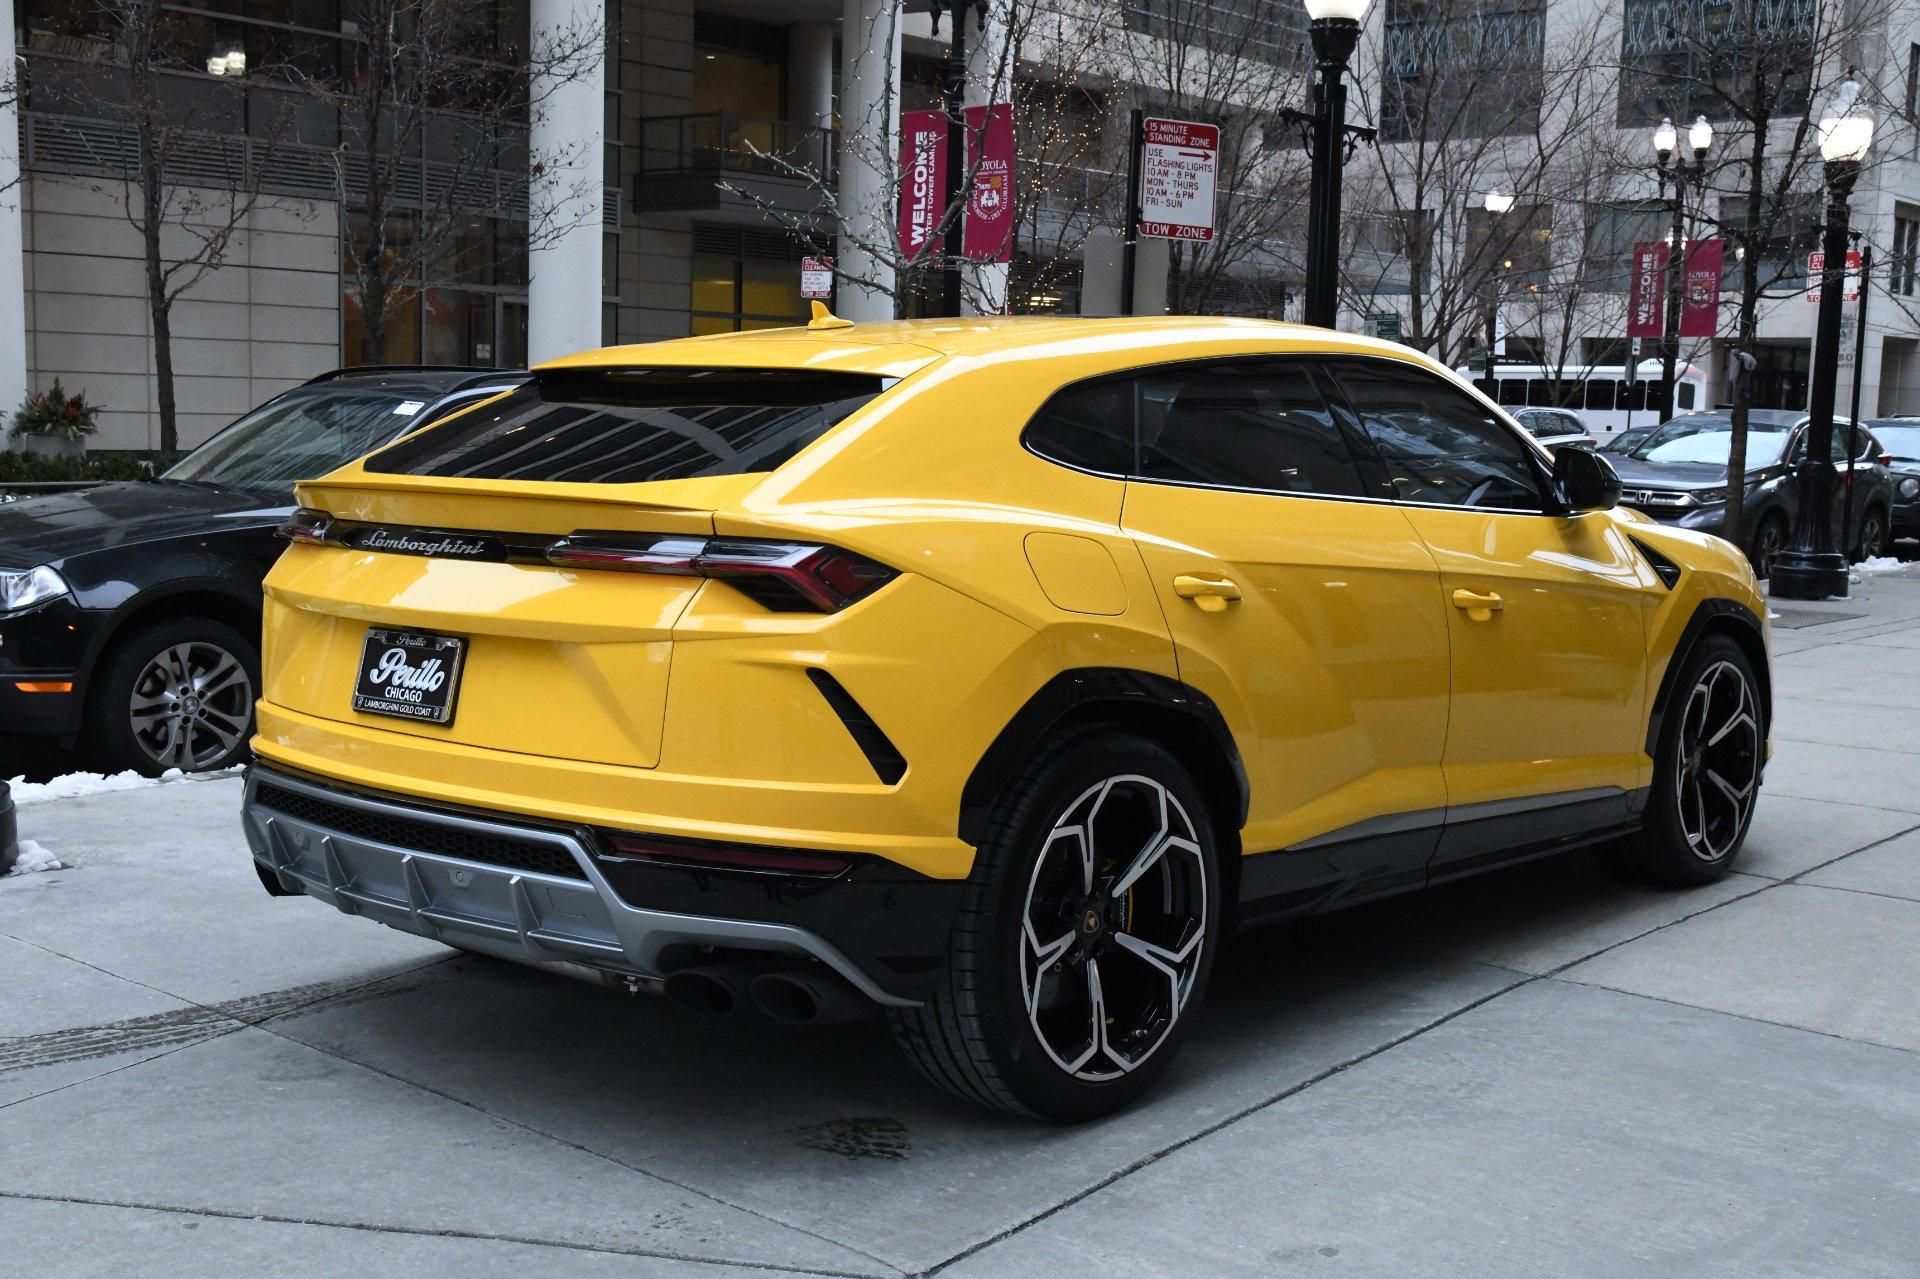 2019 Lamborghini Urus Used Lamborghini Cars Review Release